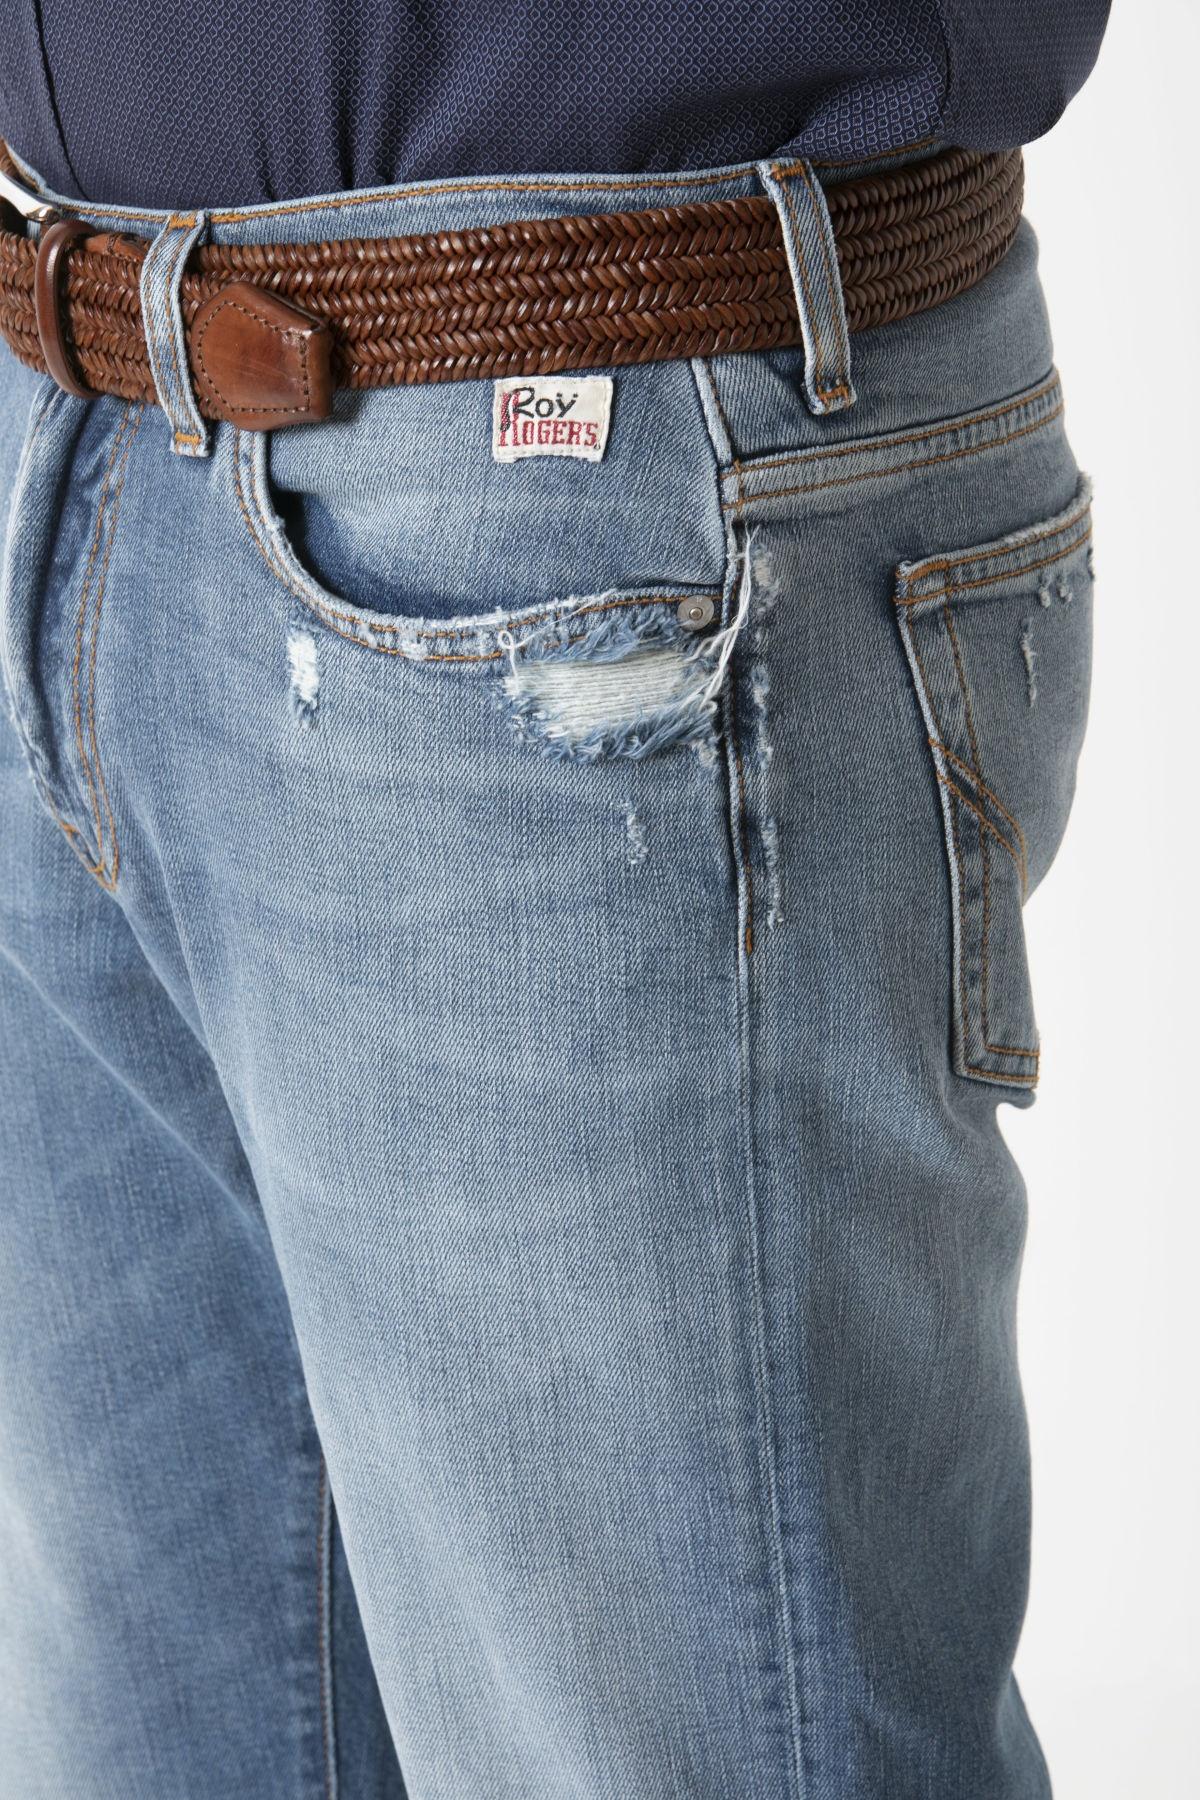 Jeans TRECHTER per uomo ROY ROGER'S A/I 19-20